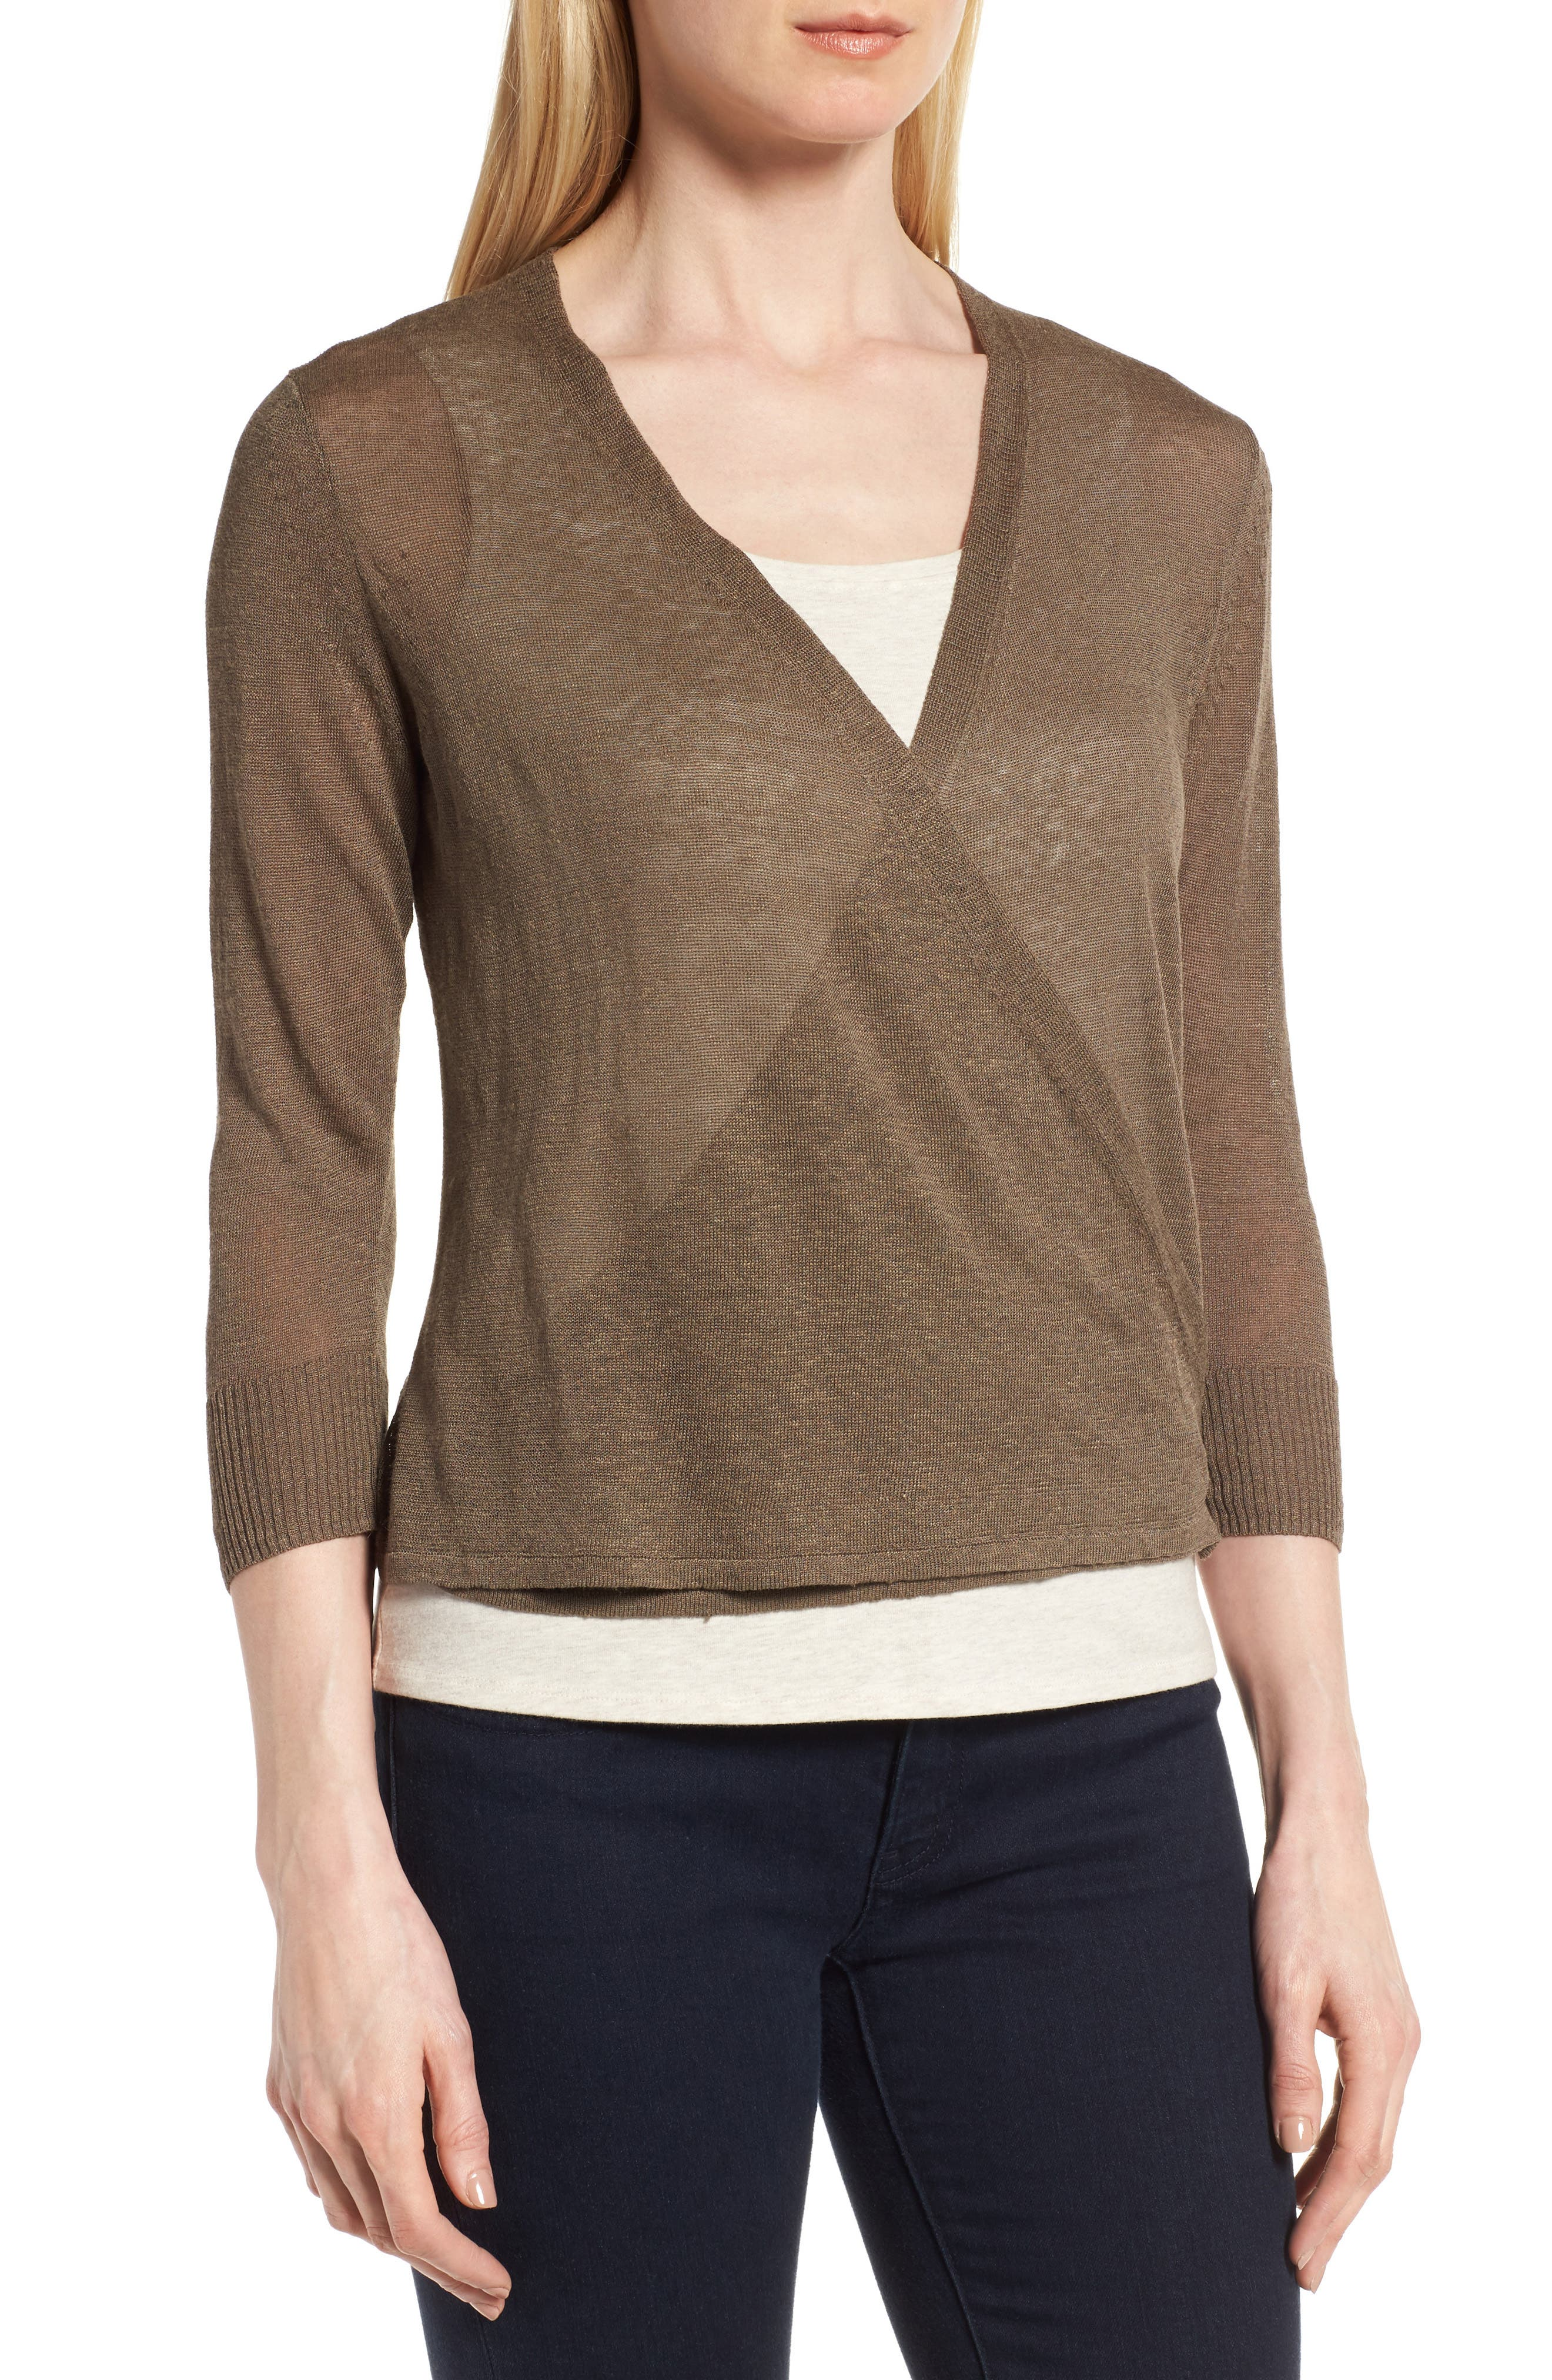 Alternate Image 3  - NIC+ZOE '4-Way' Convertible Three Quarter Sleeve Cardigan (Regular and Petite)